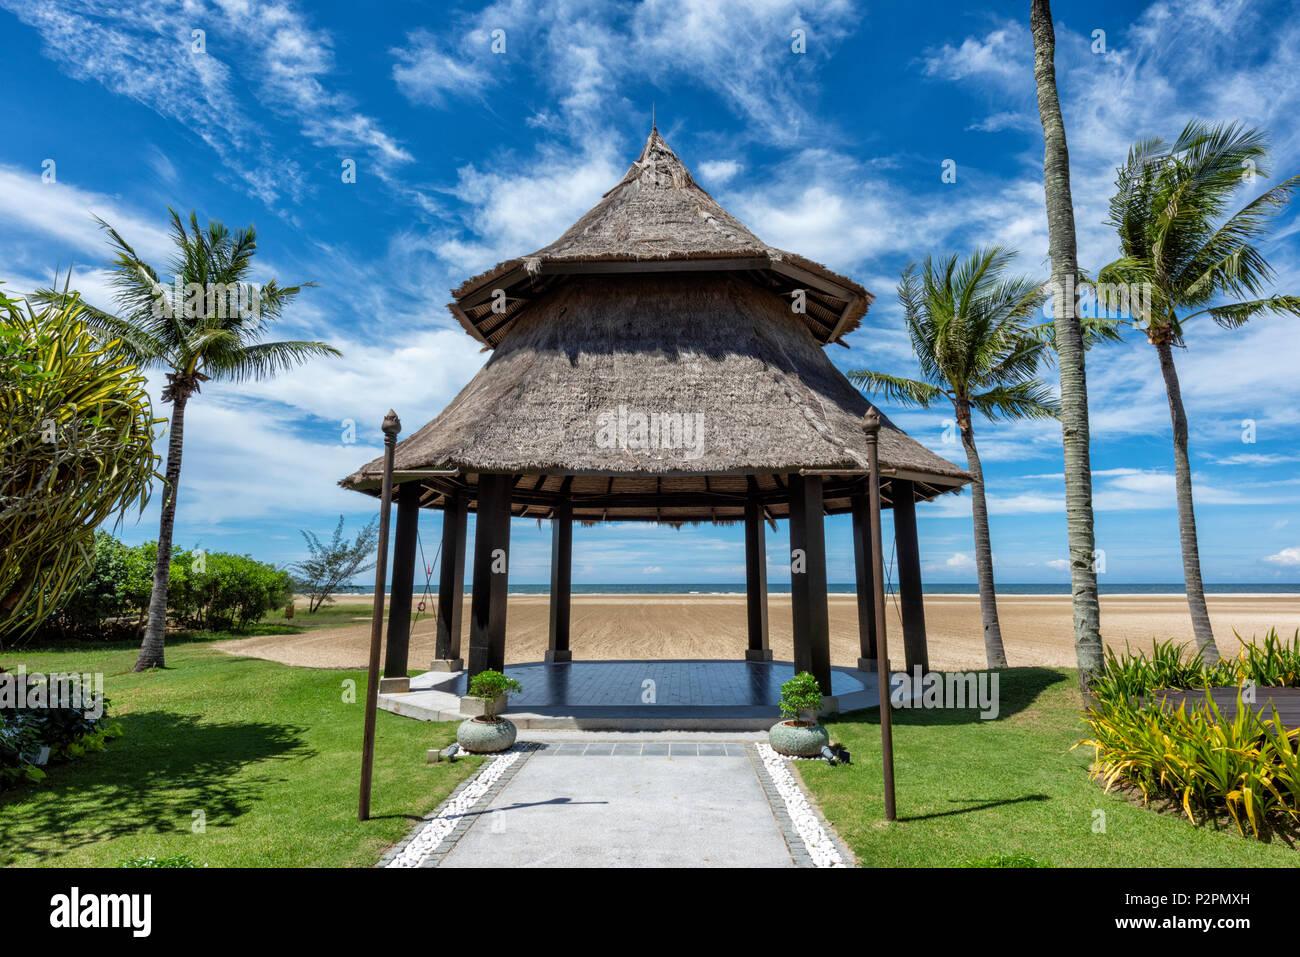 Gazebo in the ground of the Shangri La Rasa Ria Hotel at Kota Kinabalu, Borneo, Malaysia - Stock Image